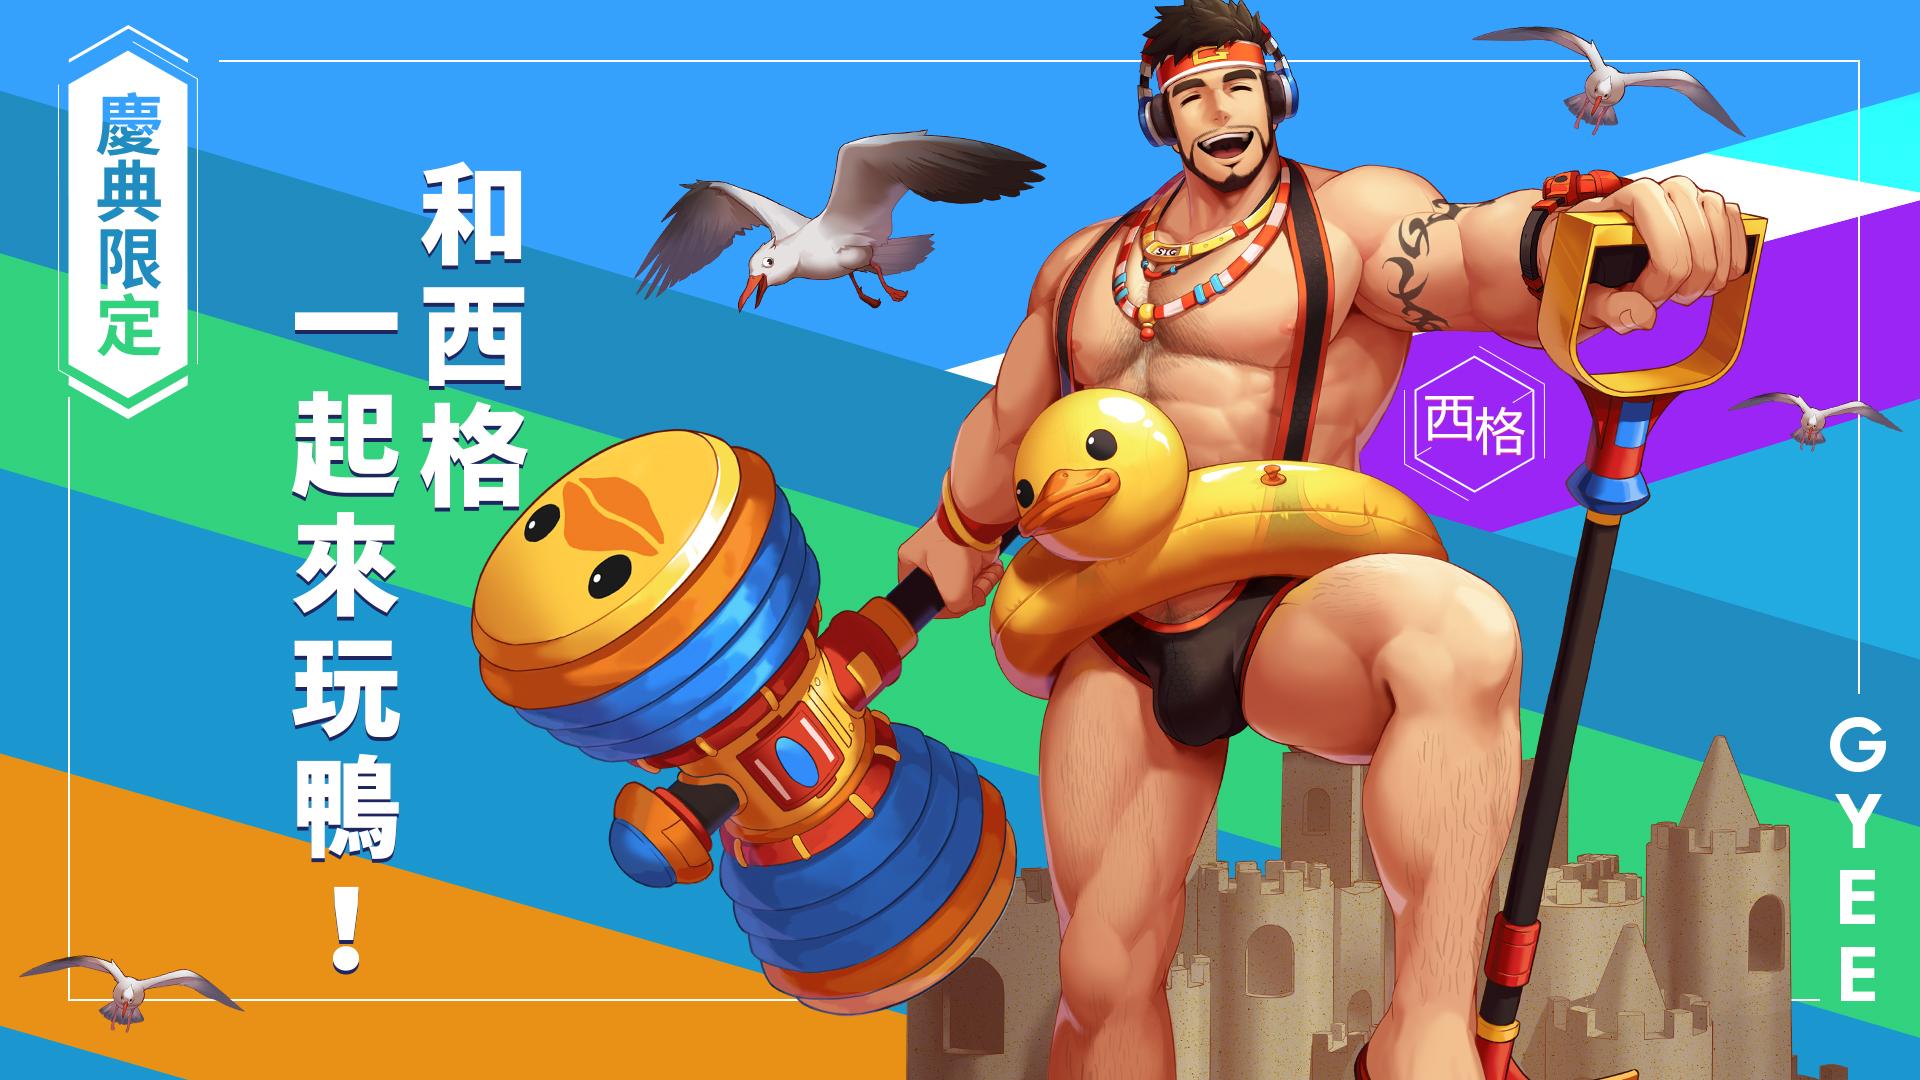 10月17日:彩虹慶典開啟-sig-summer.jpg